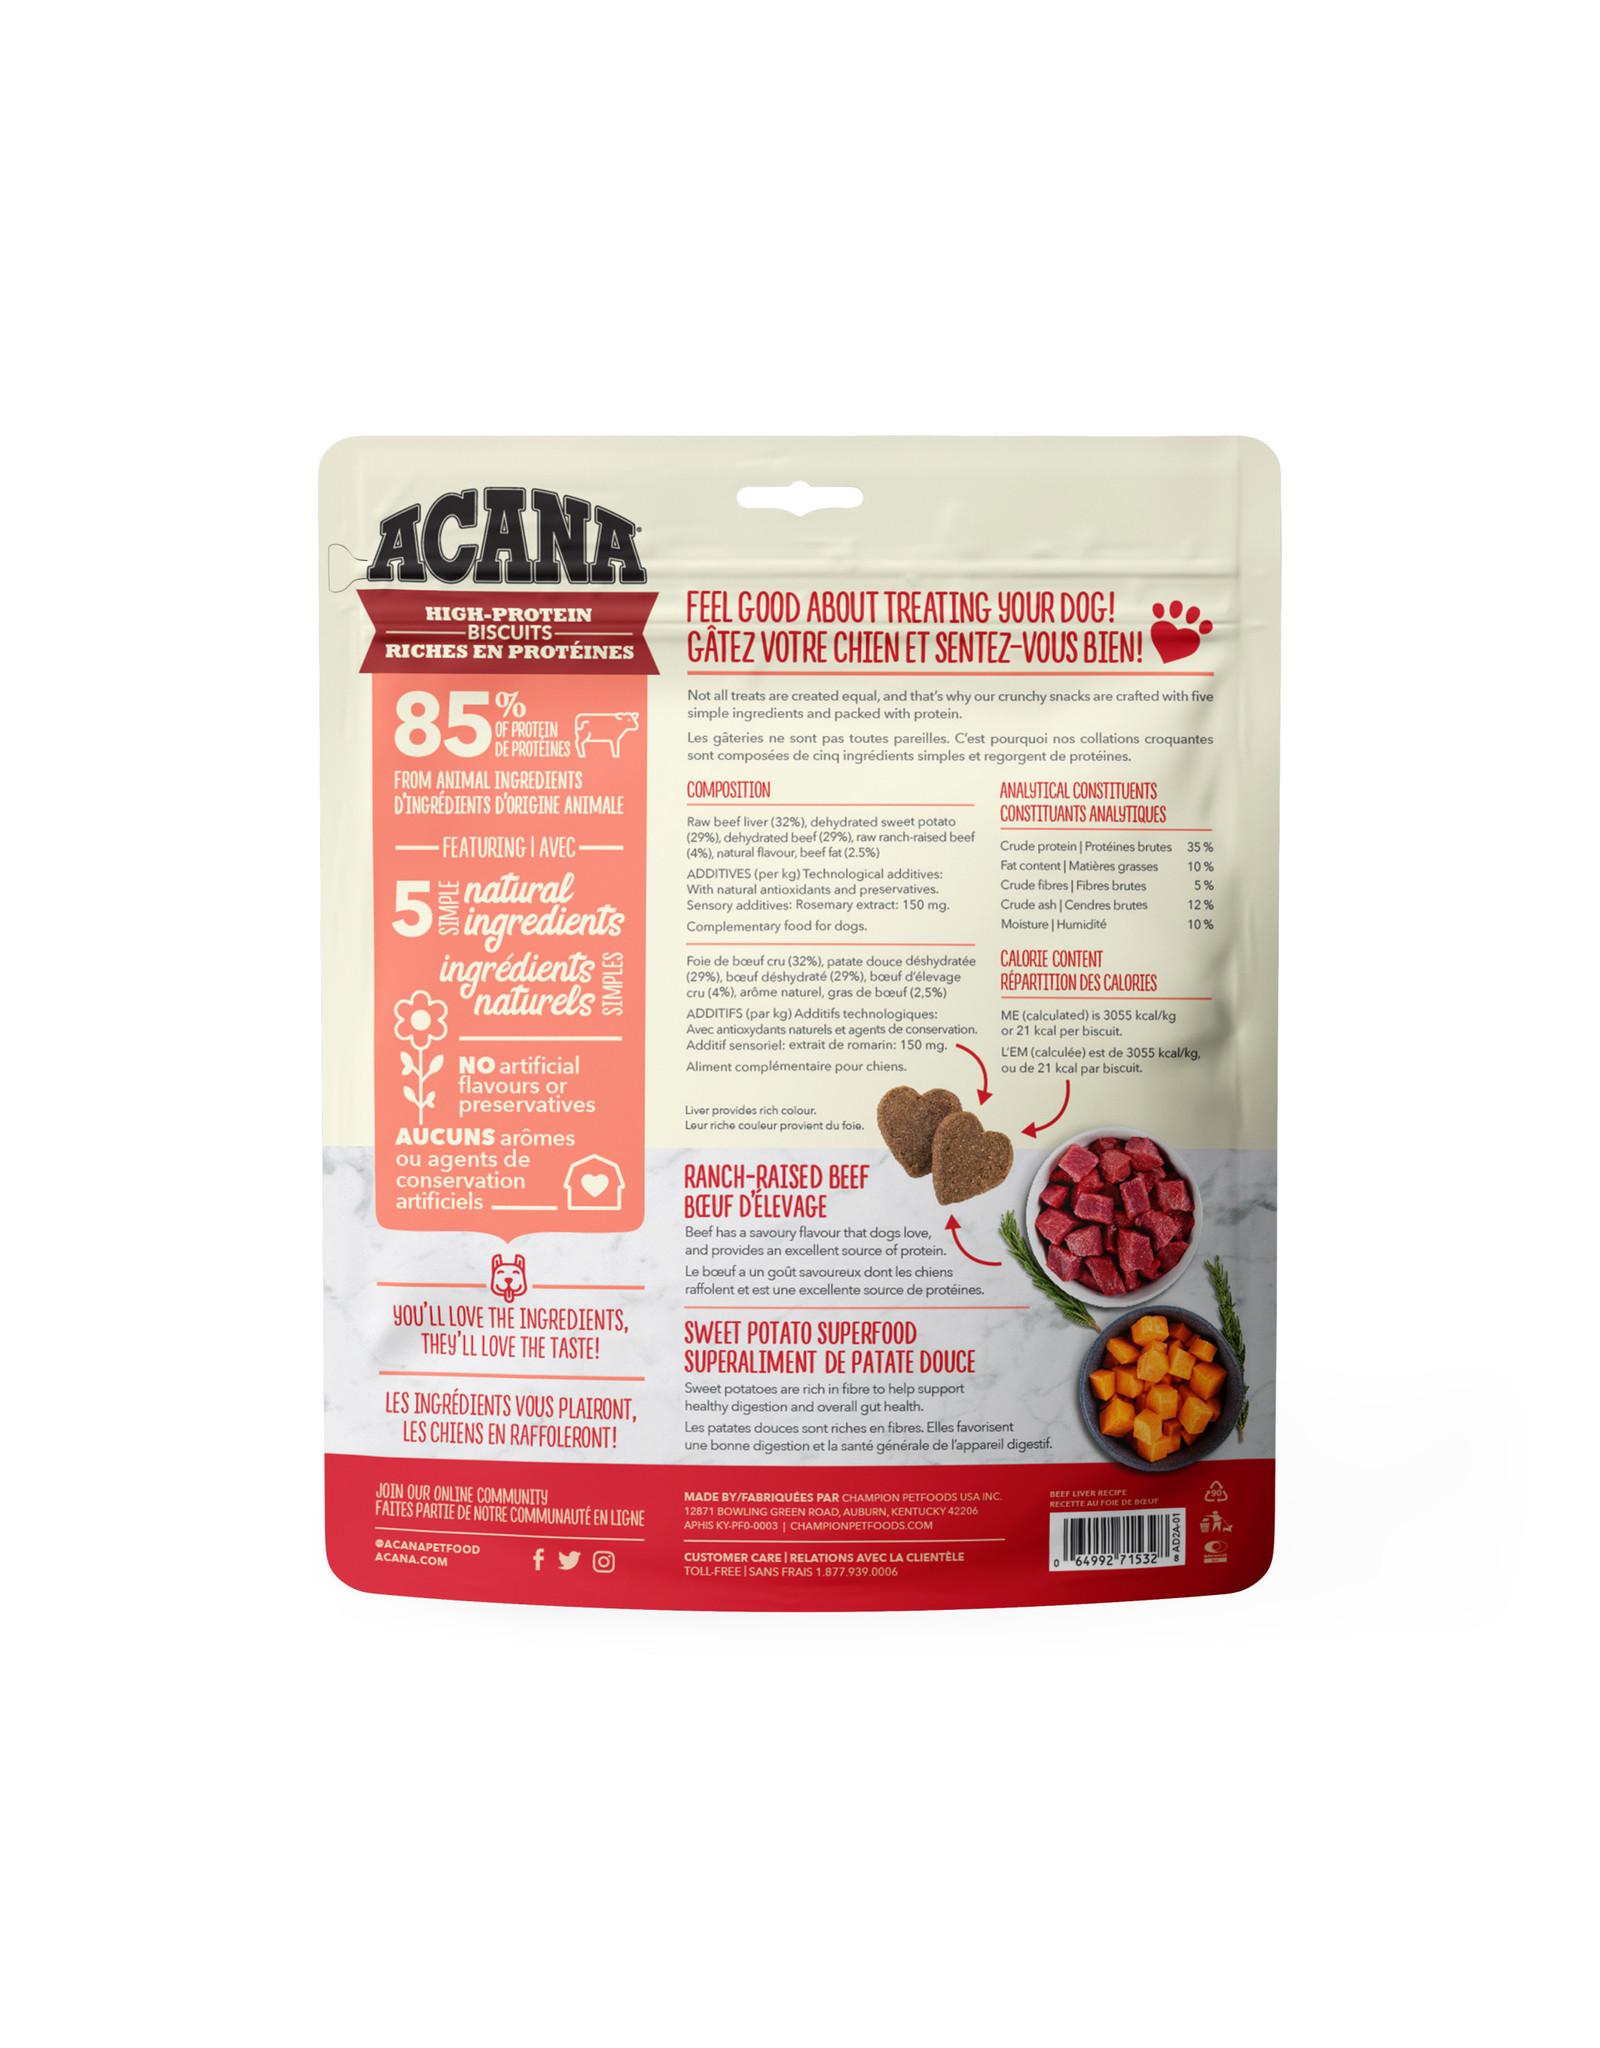 ACANA ACANA High-Protein Biscuits Crunchy Beef Liver